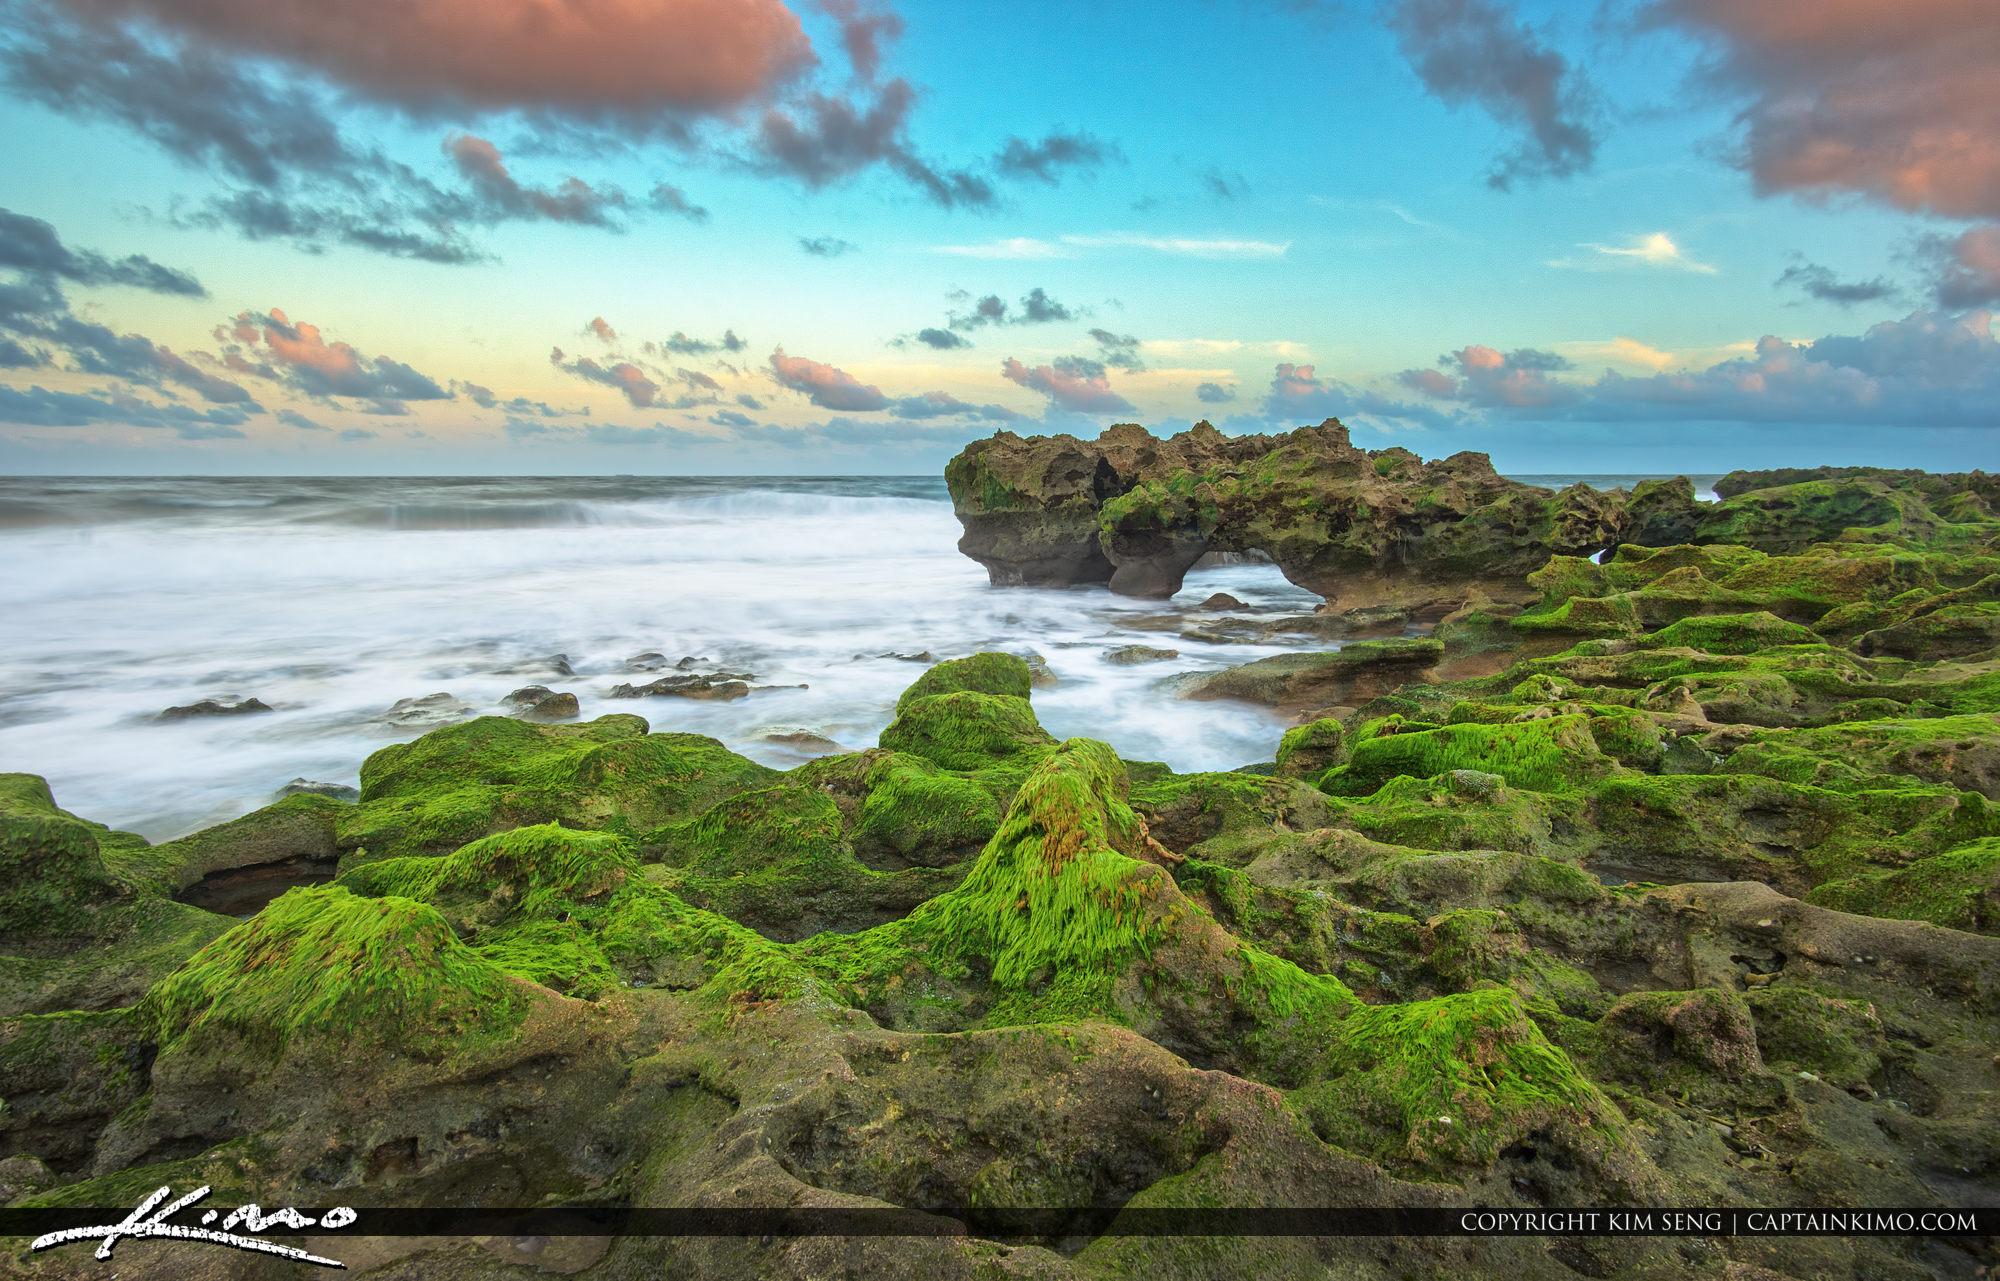 Coral Cove Beach Rock with Algae